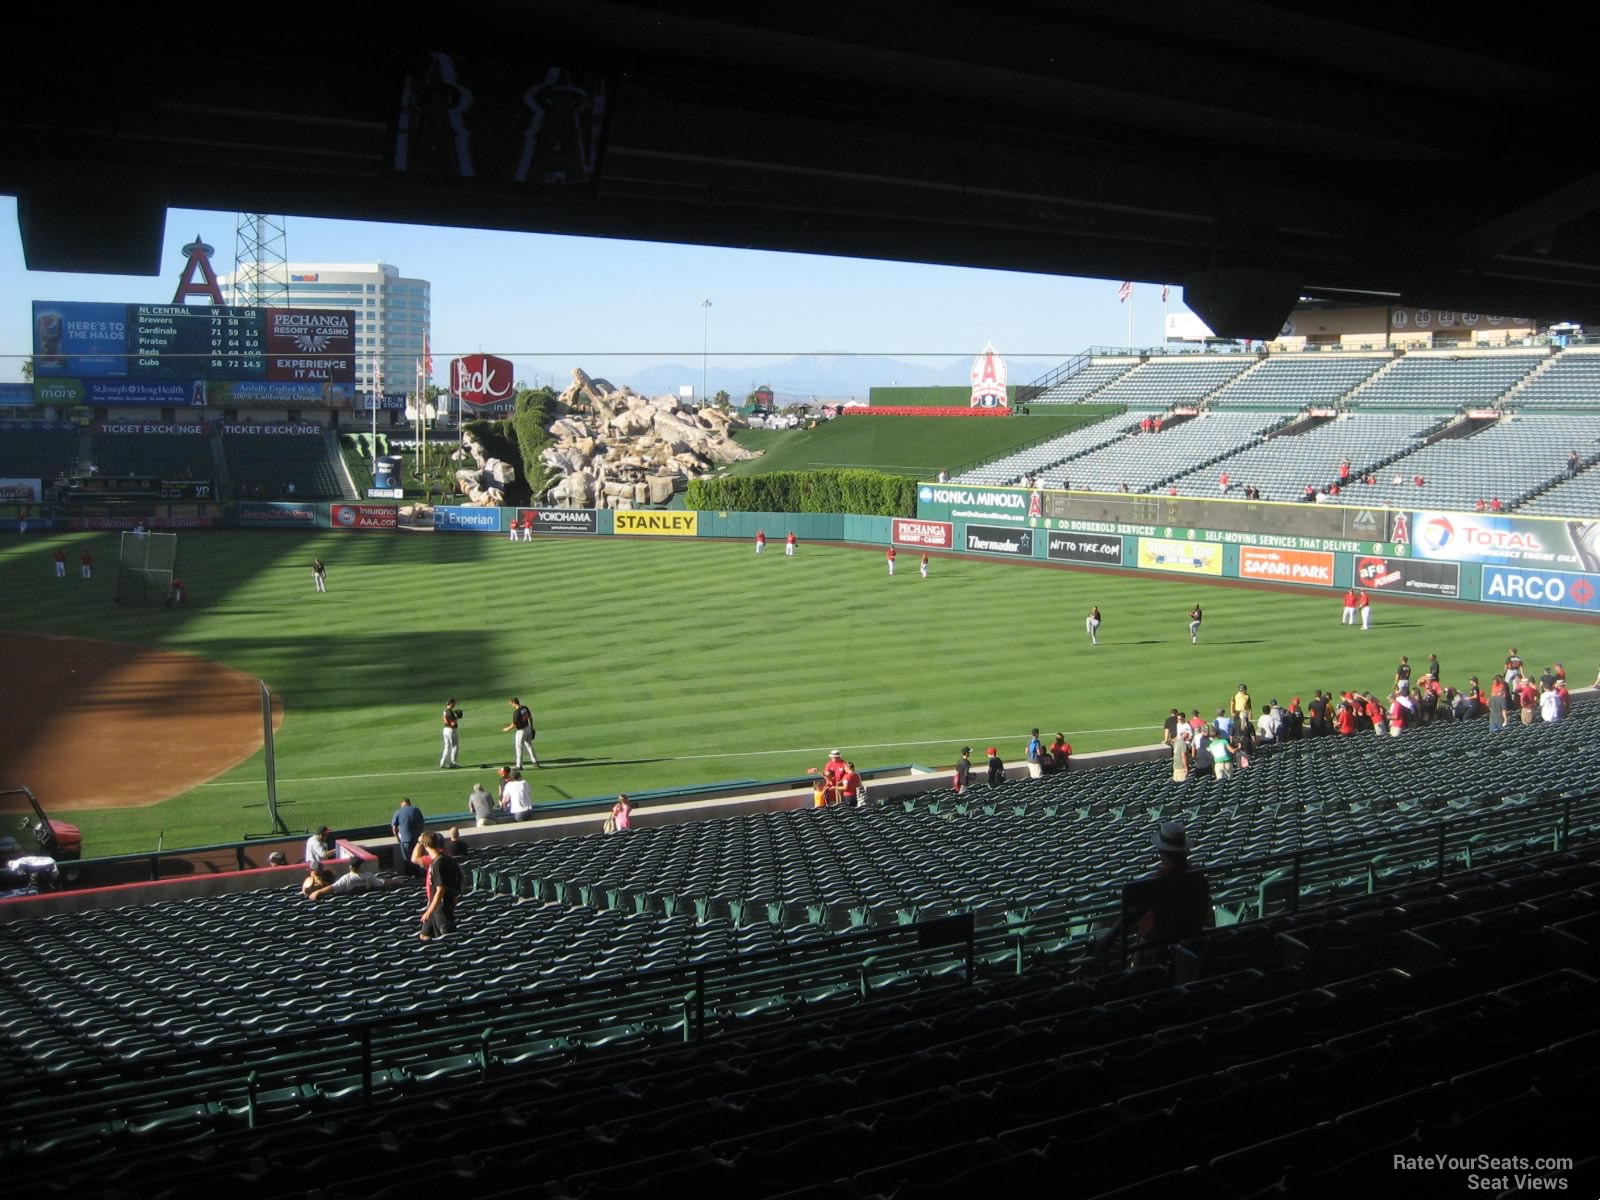 Angel Stadium Section 224 - RateYourSeats.com